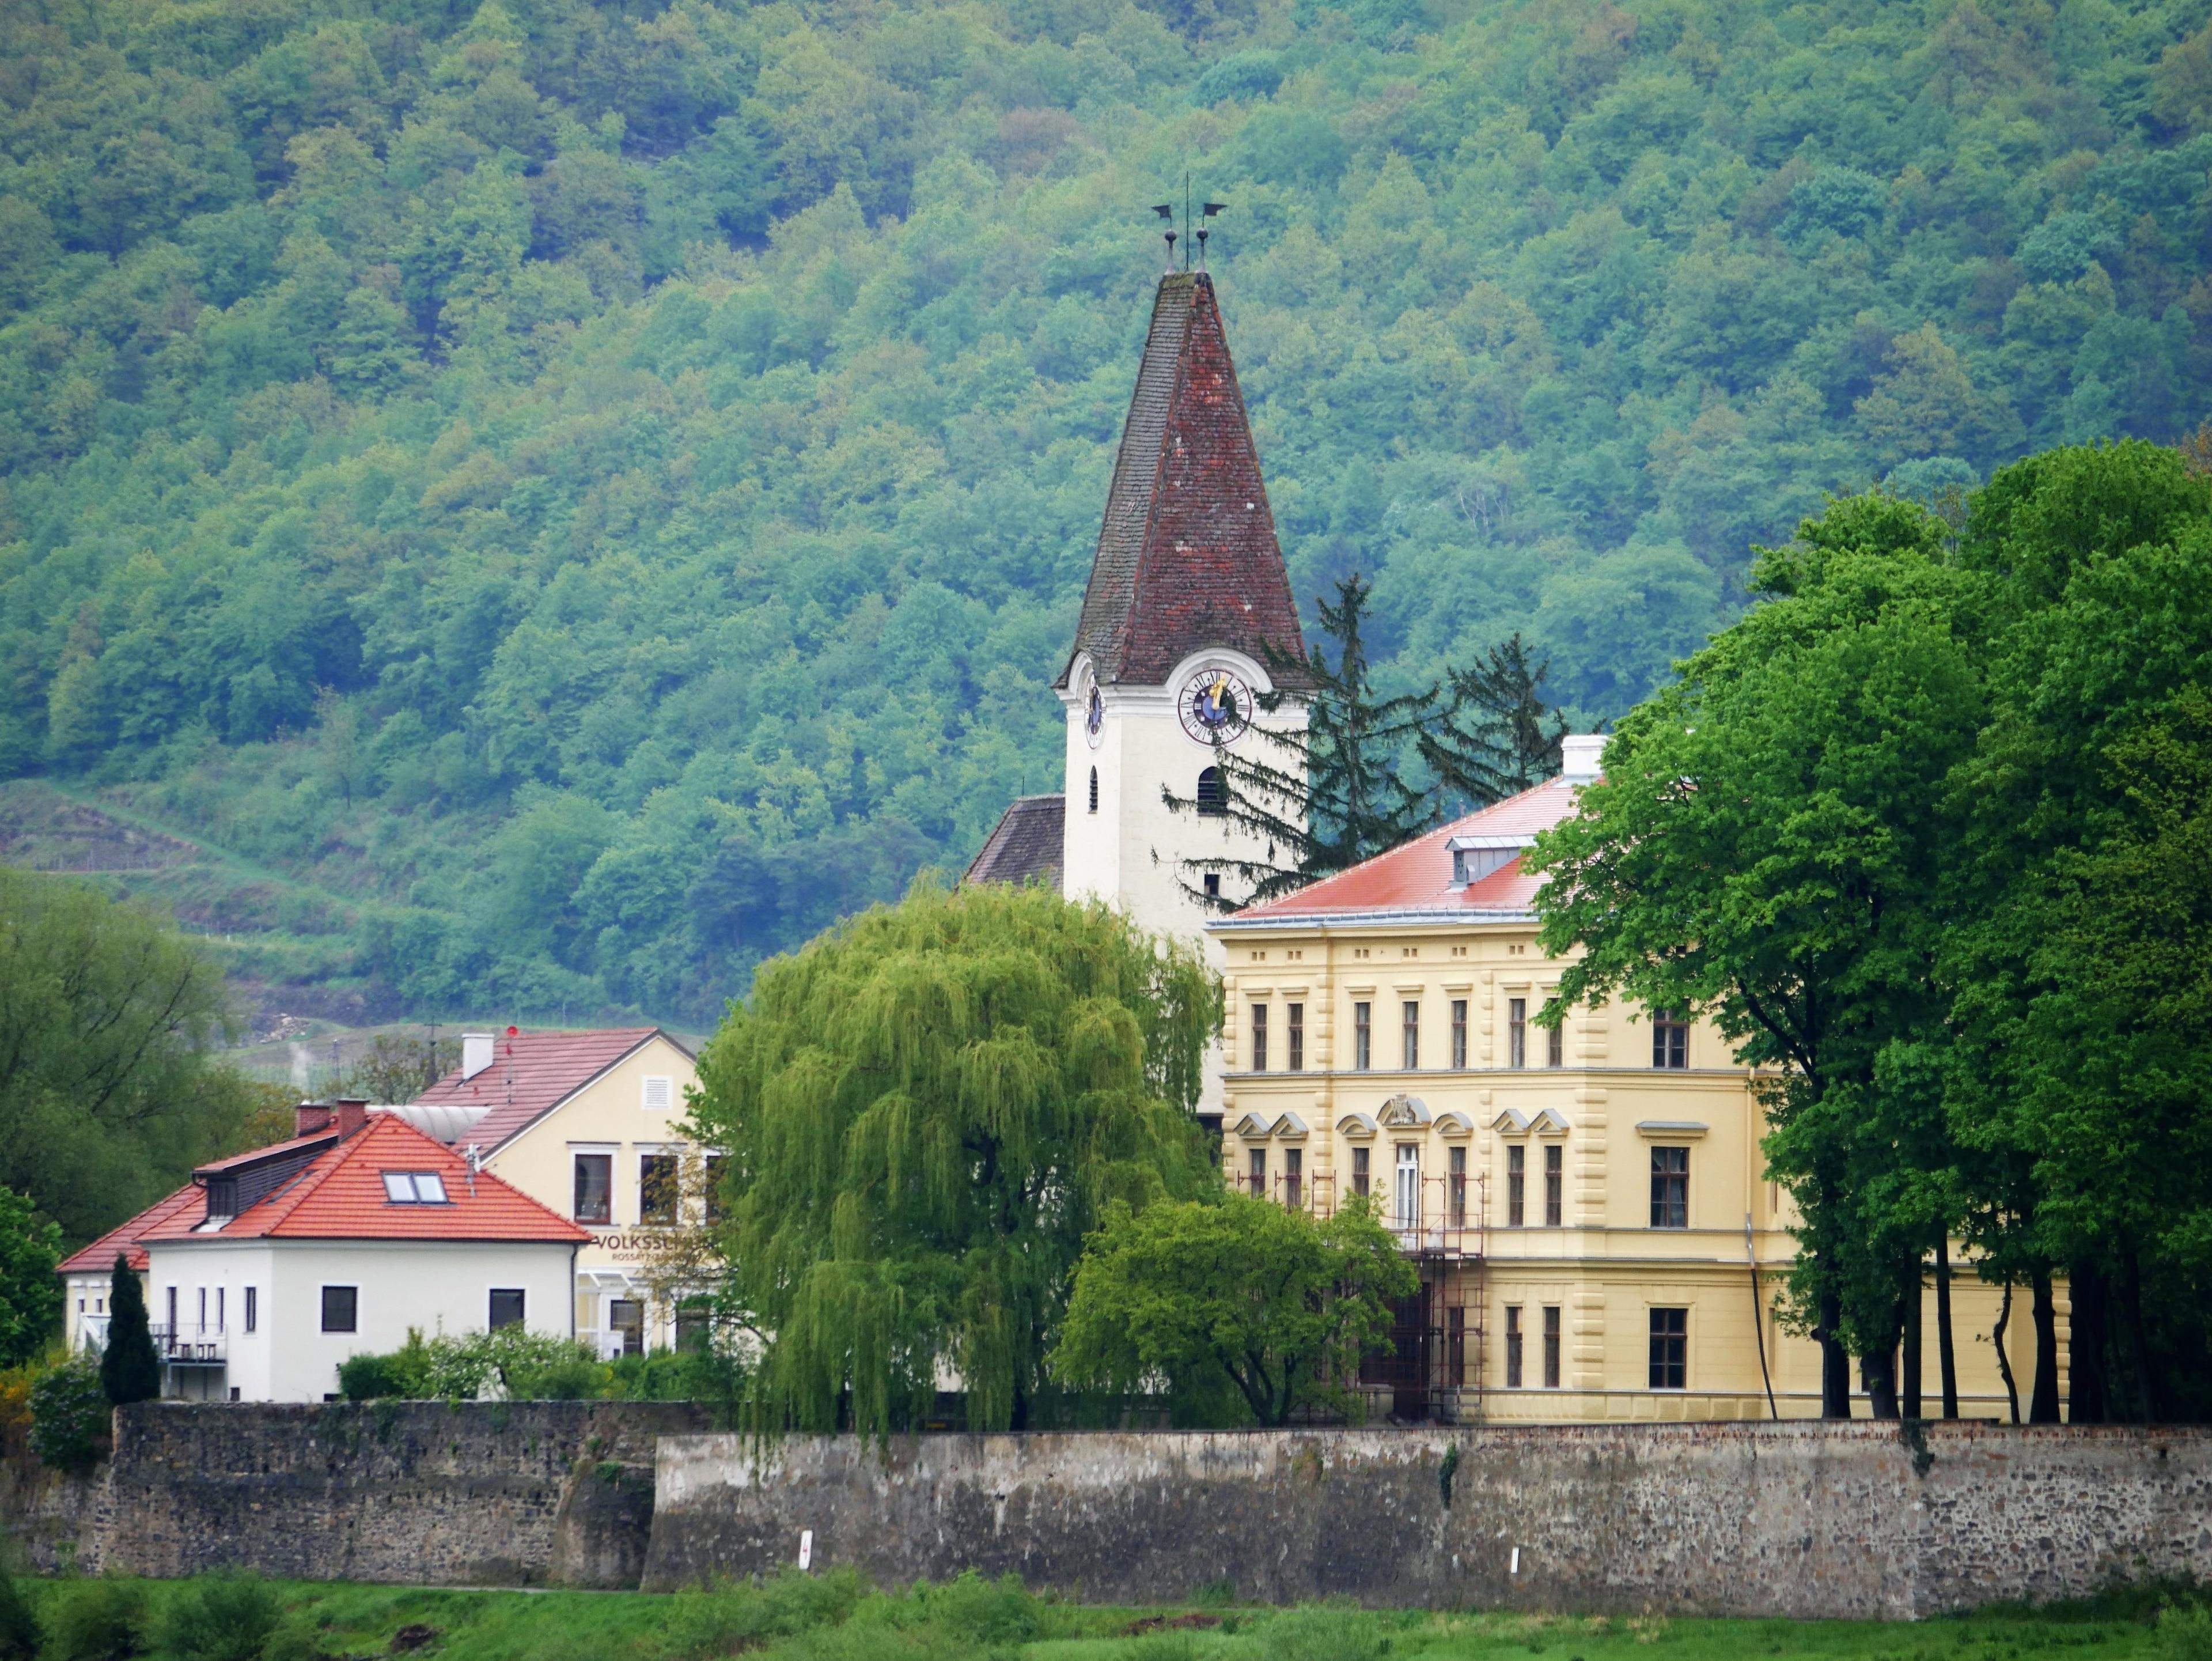 Rossatz-Arnsdorf, Lower Austria, Austria